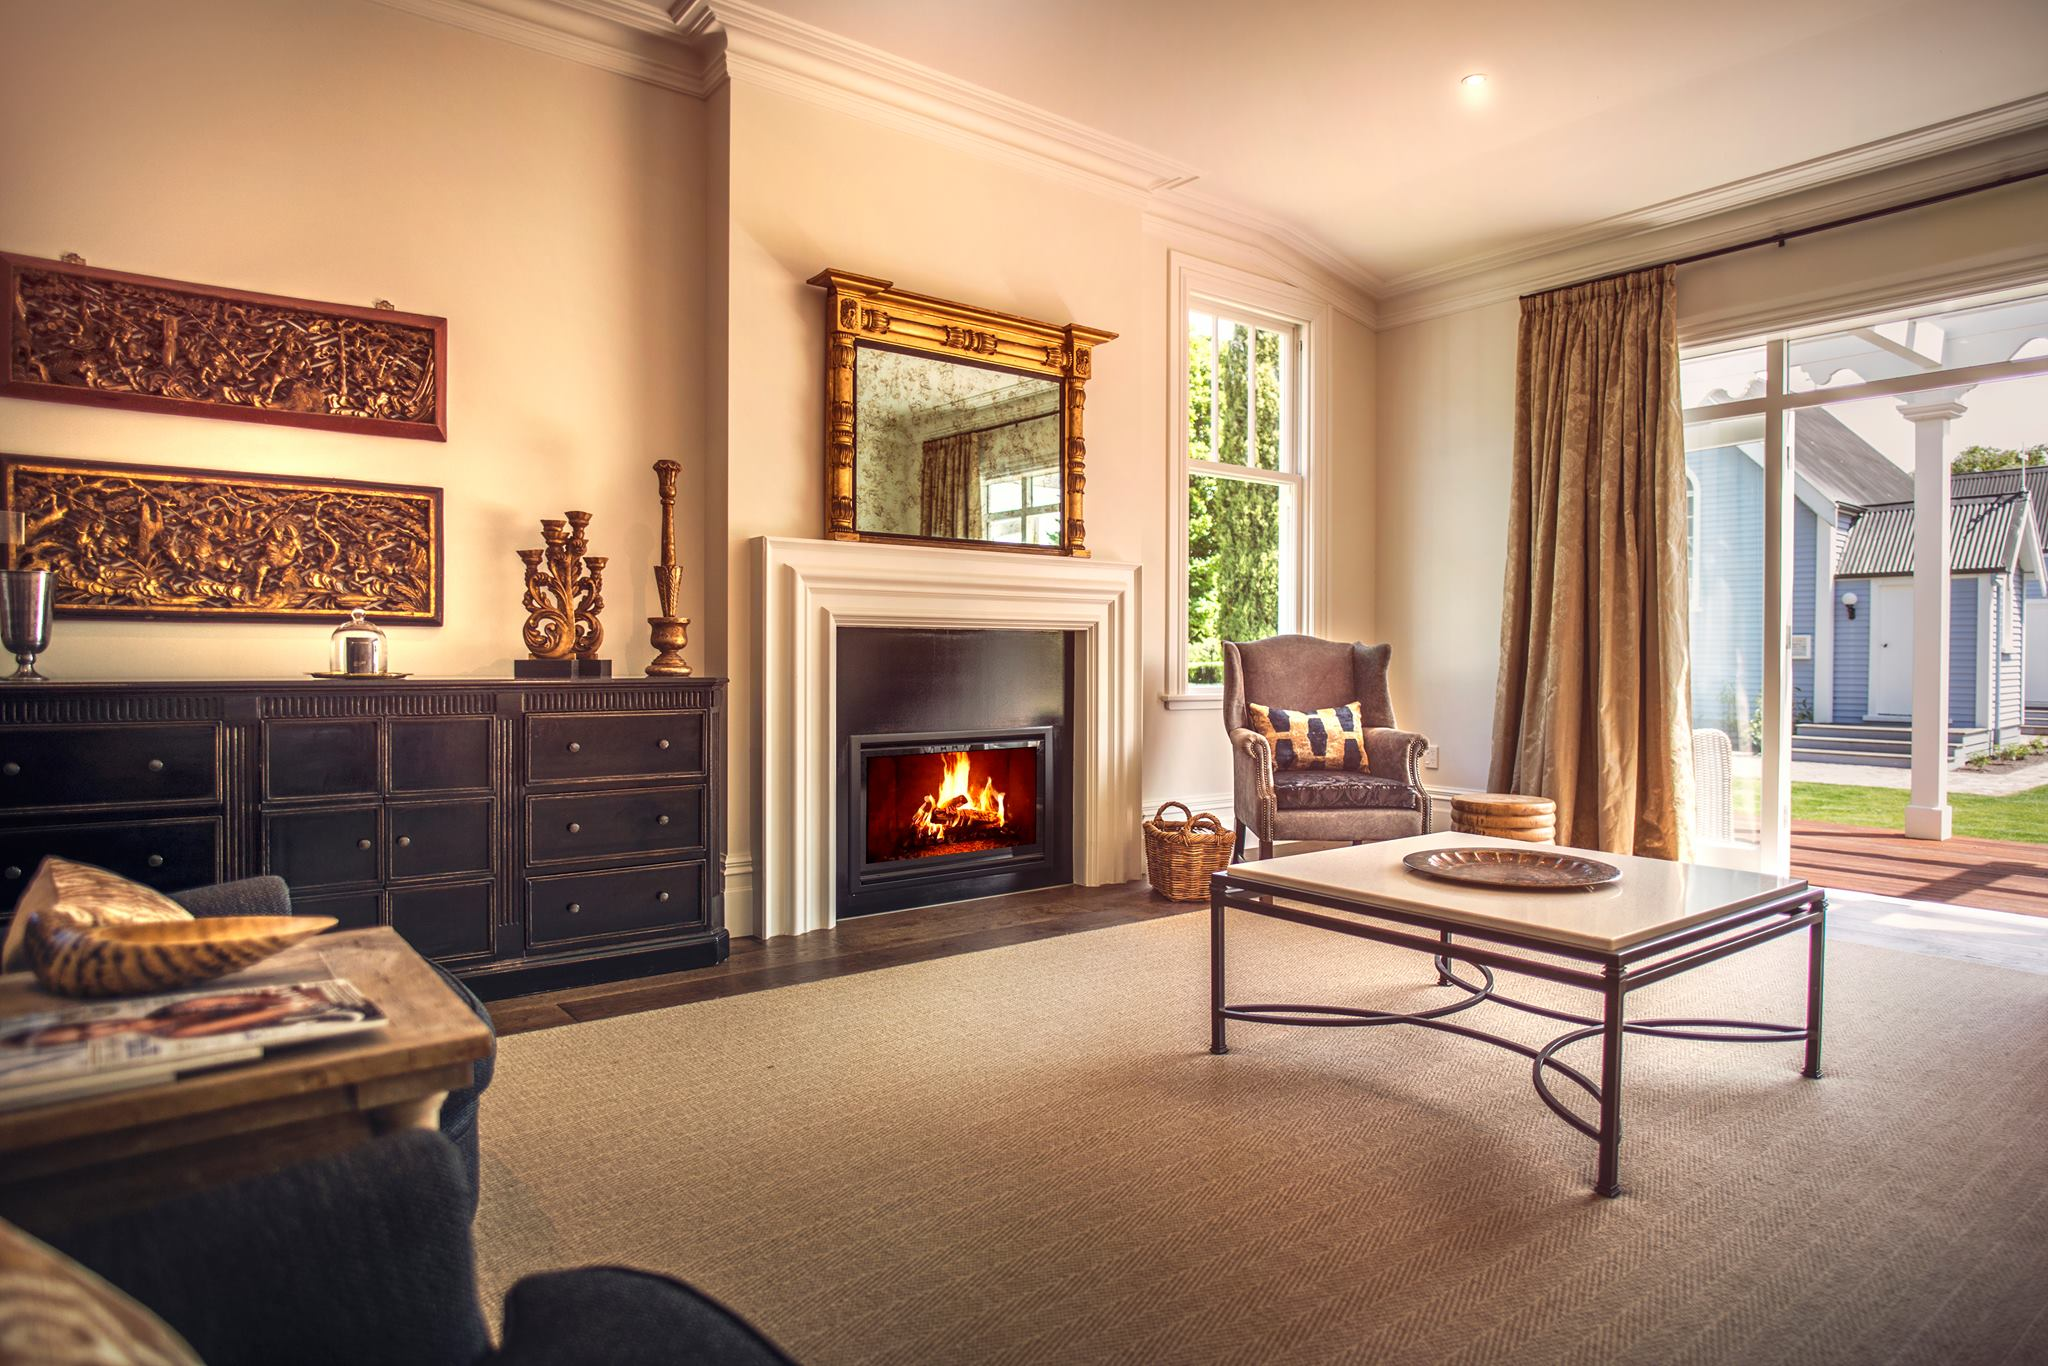 New Zealand's Marlborough Lodge Opens Following Major Refurbishment Program 6